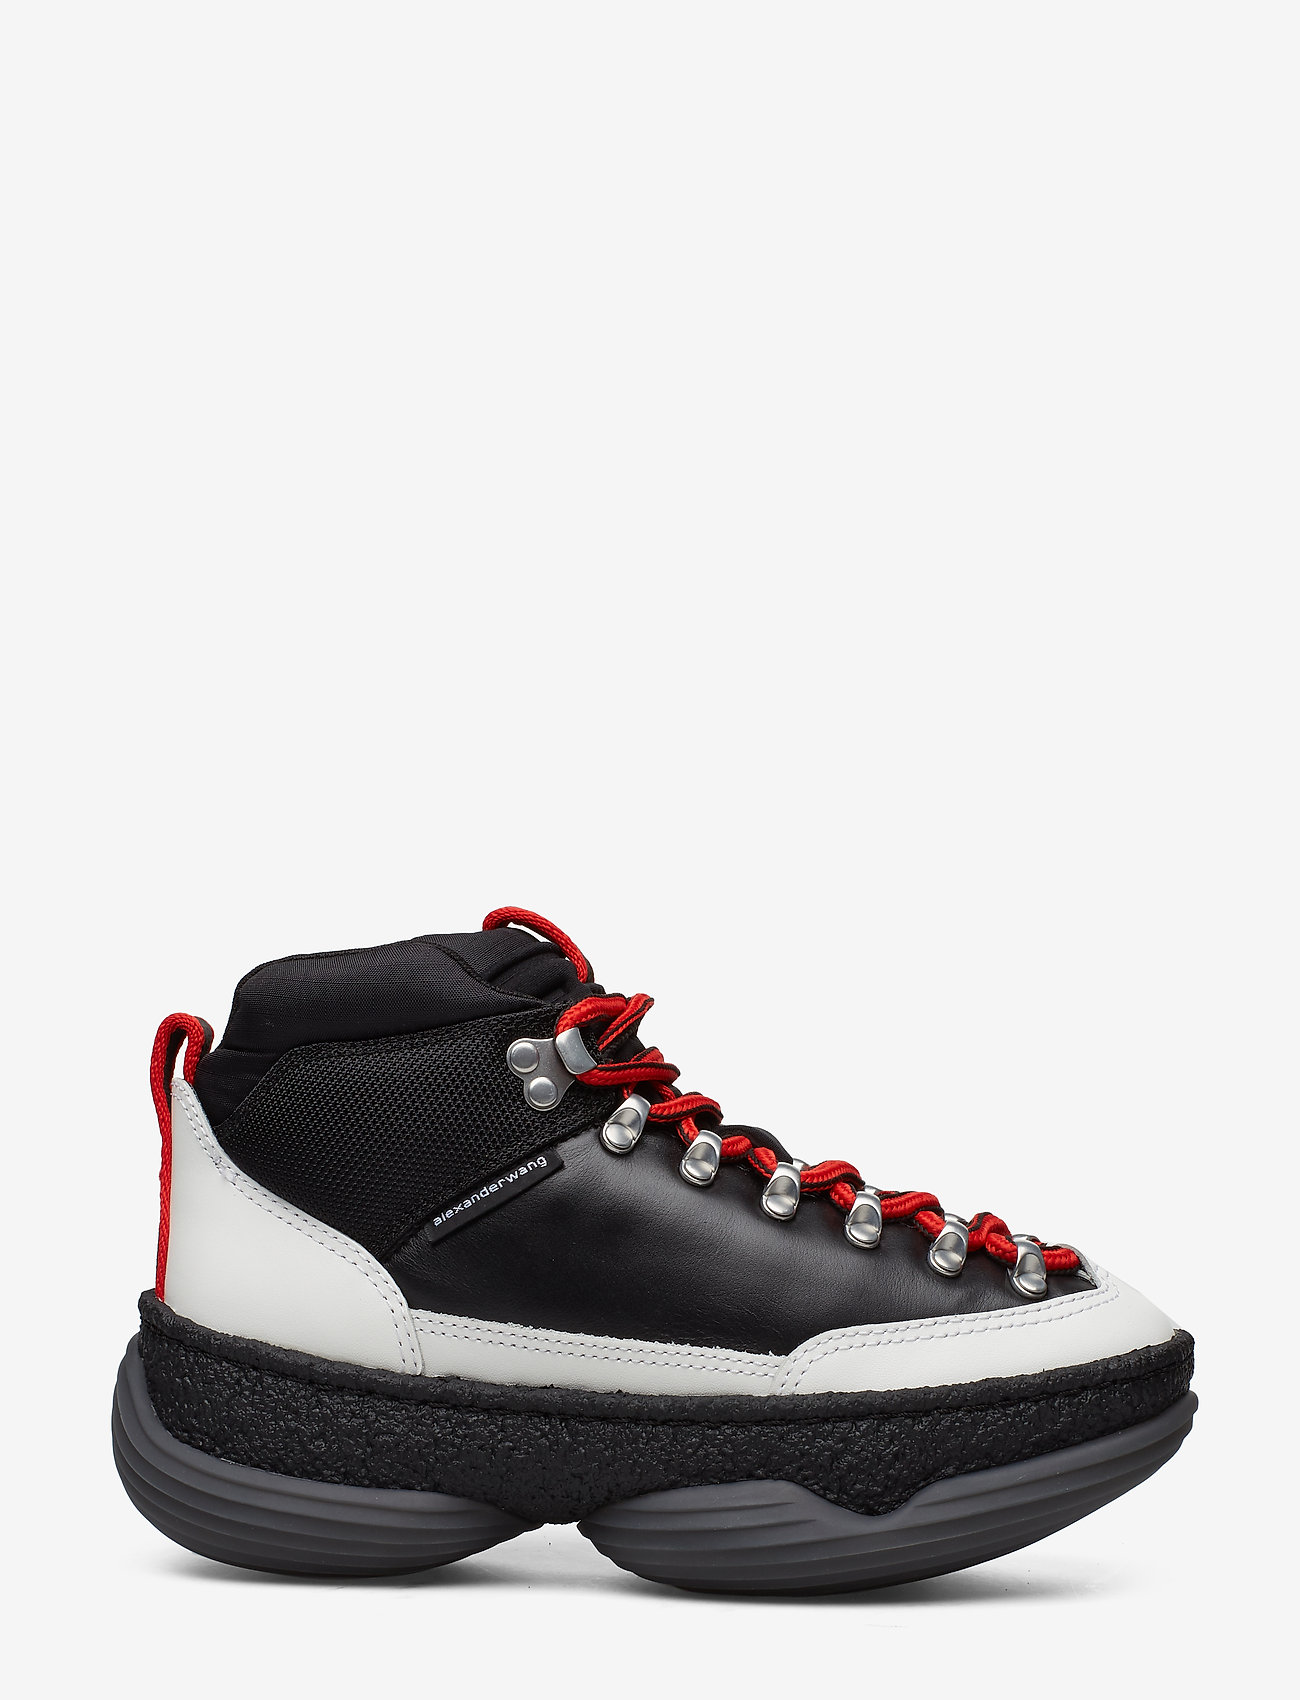 Alexander Wang - a1 HIKER BLACK/RED - chunky sneakers - black - 1